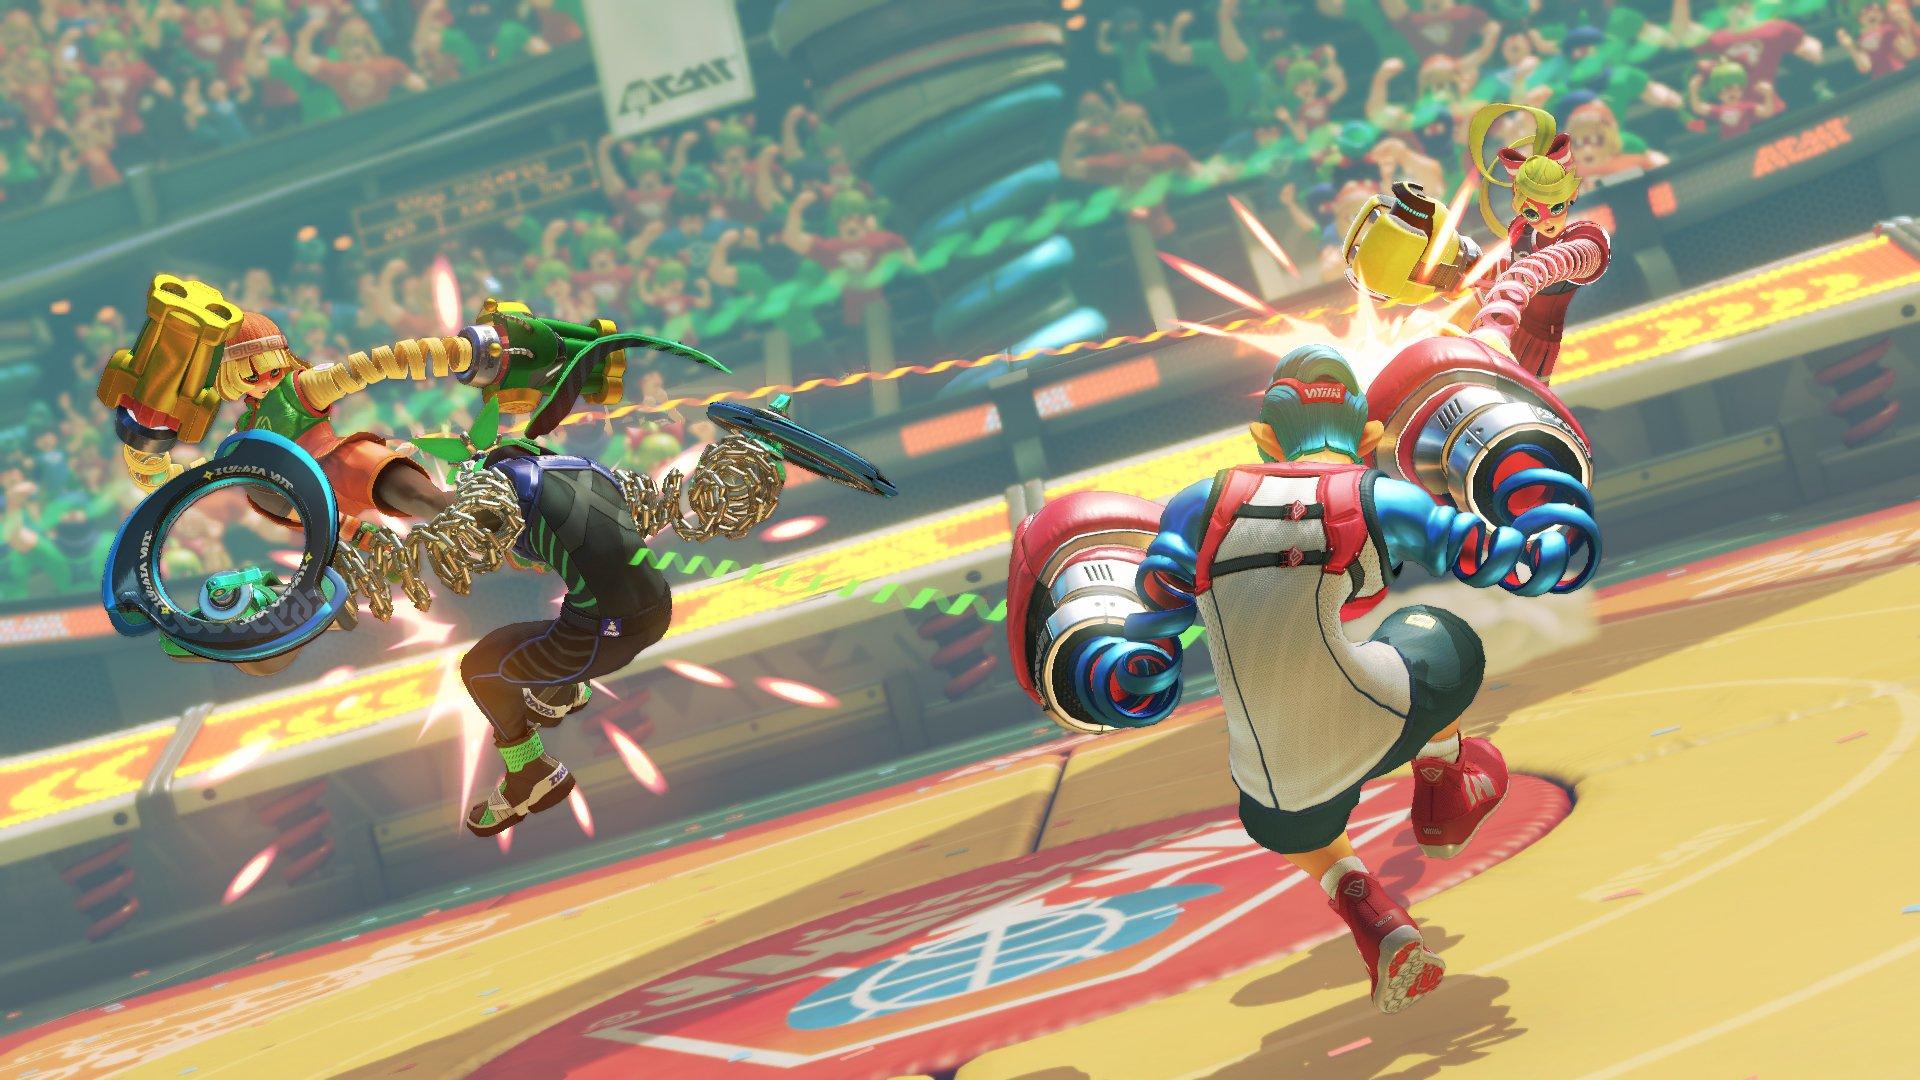 Nintendo Switch Arms Game - HD Wallpaper